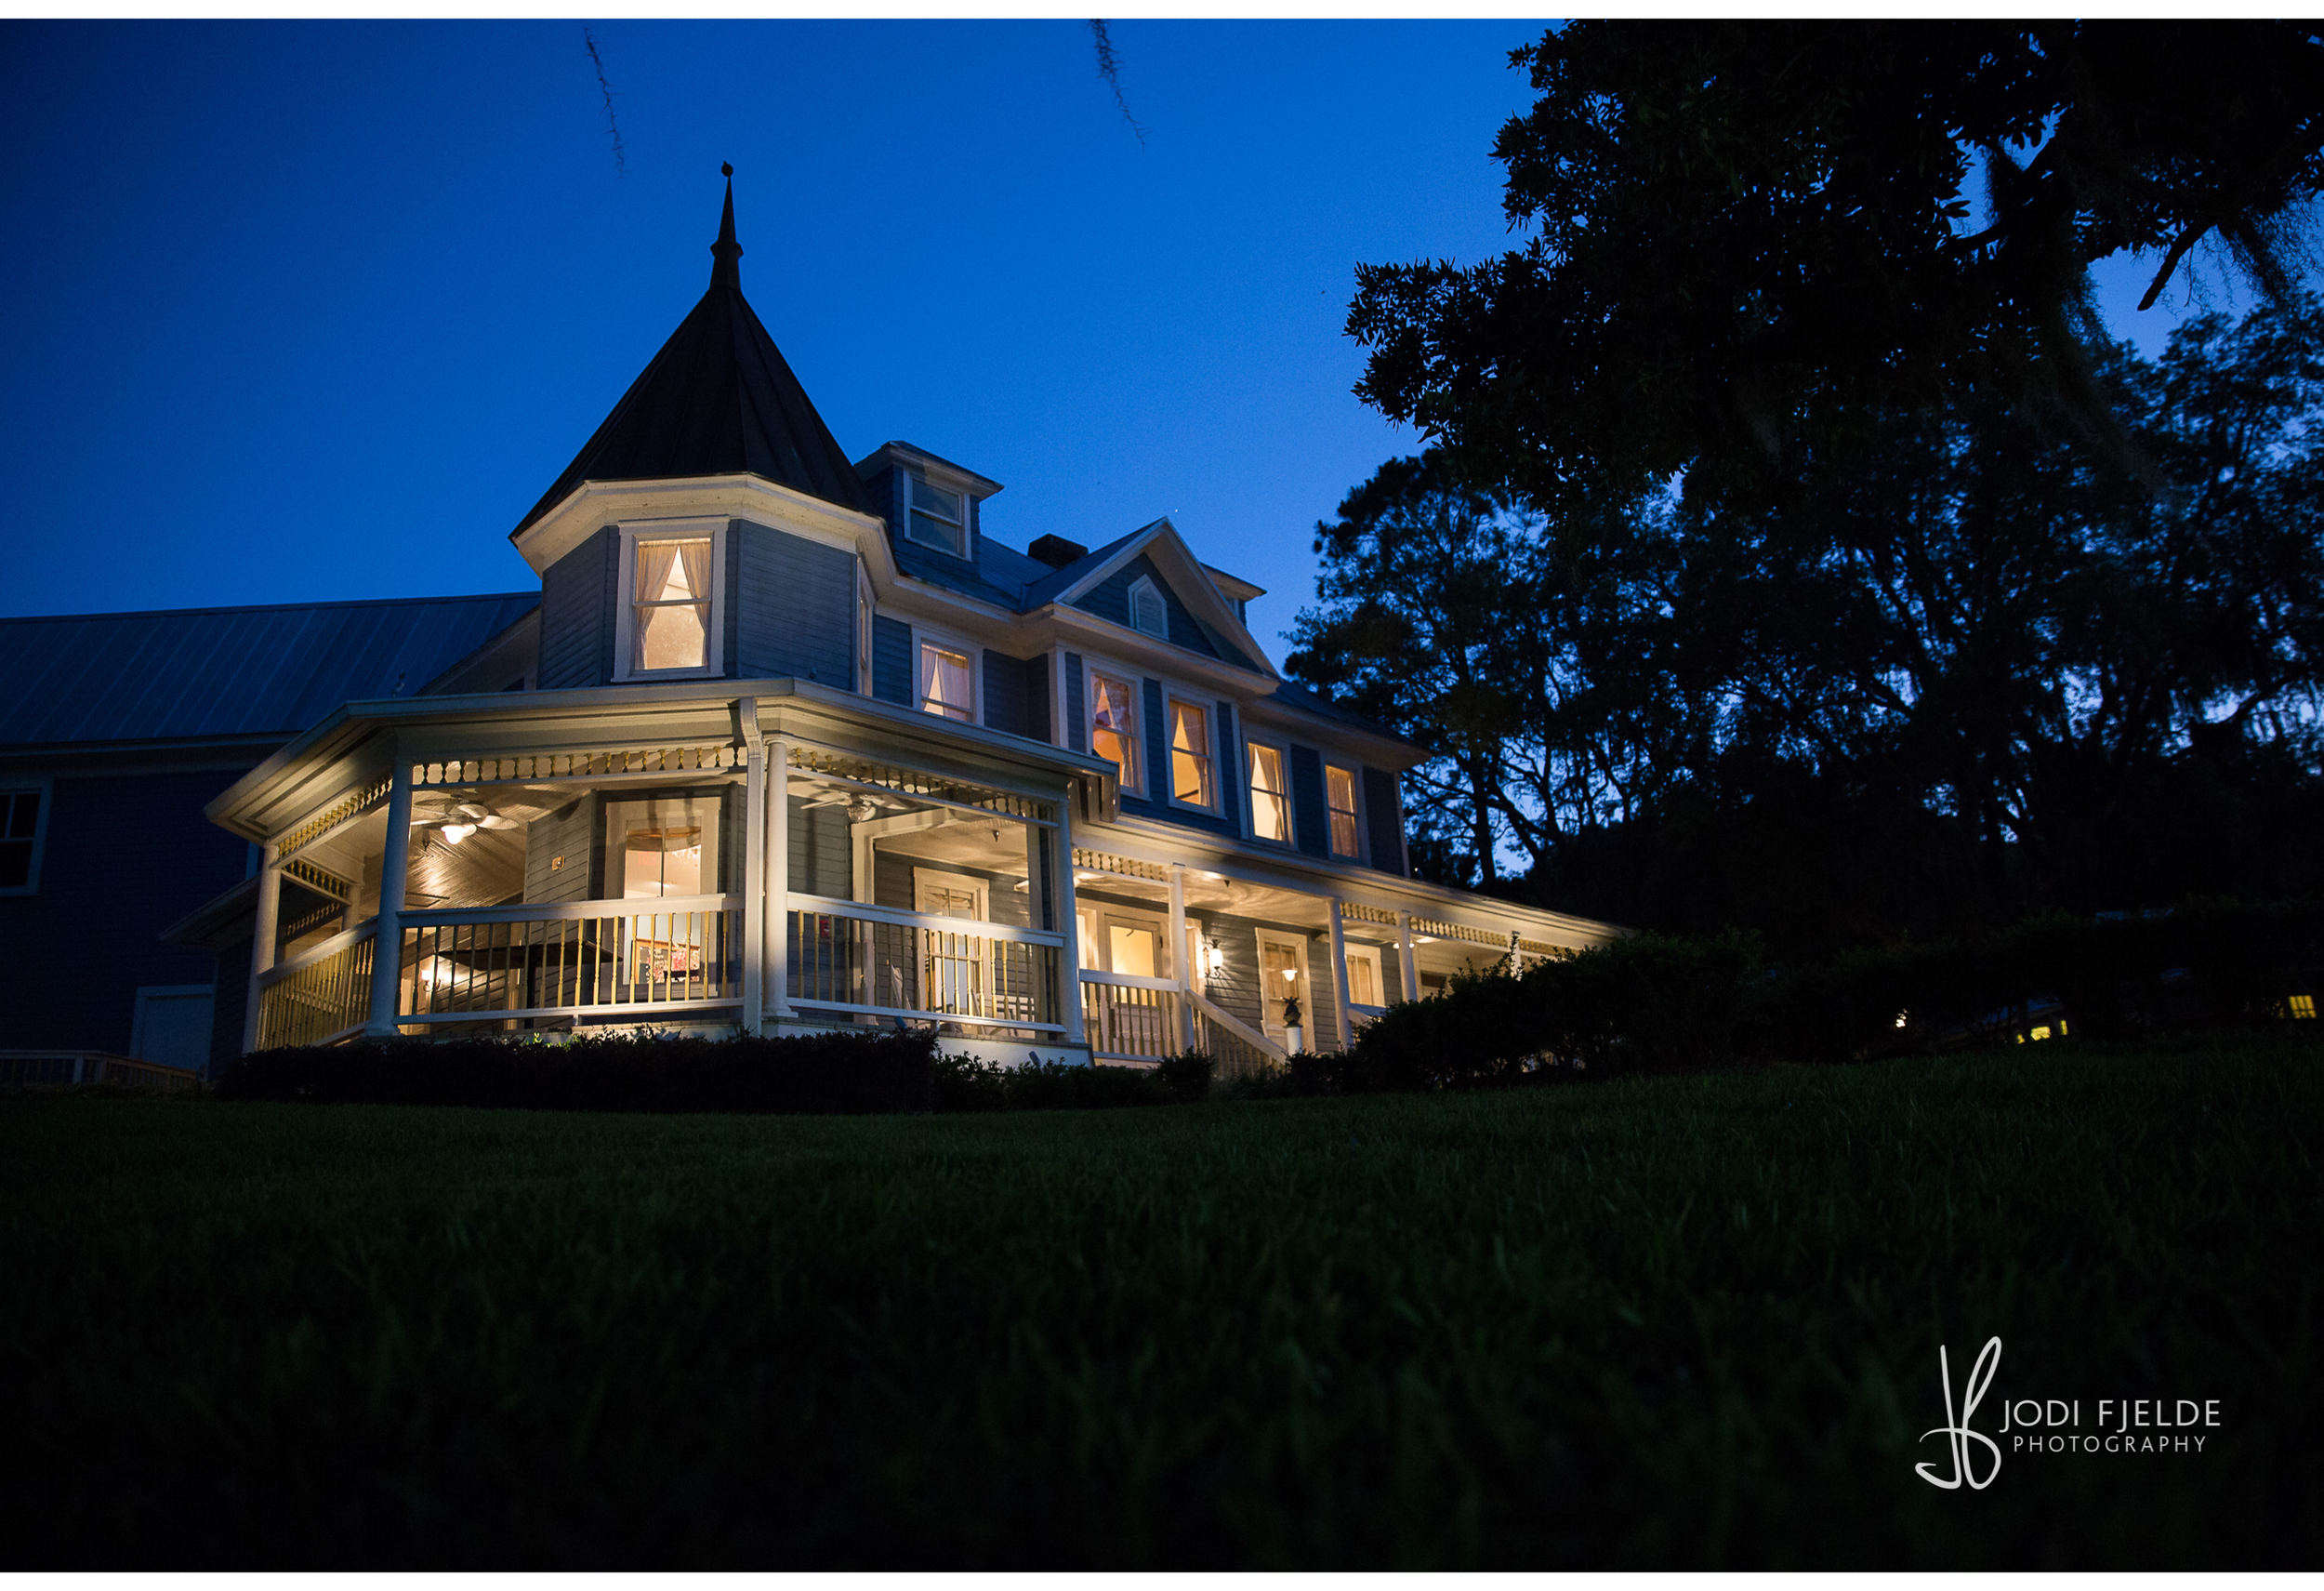 Highland_Manor_Apopka_Florida_wedding_Jackie_&_Tim_photography_jodi_Fjelde_photography-38.jpg